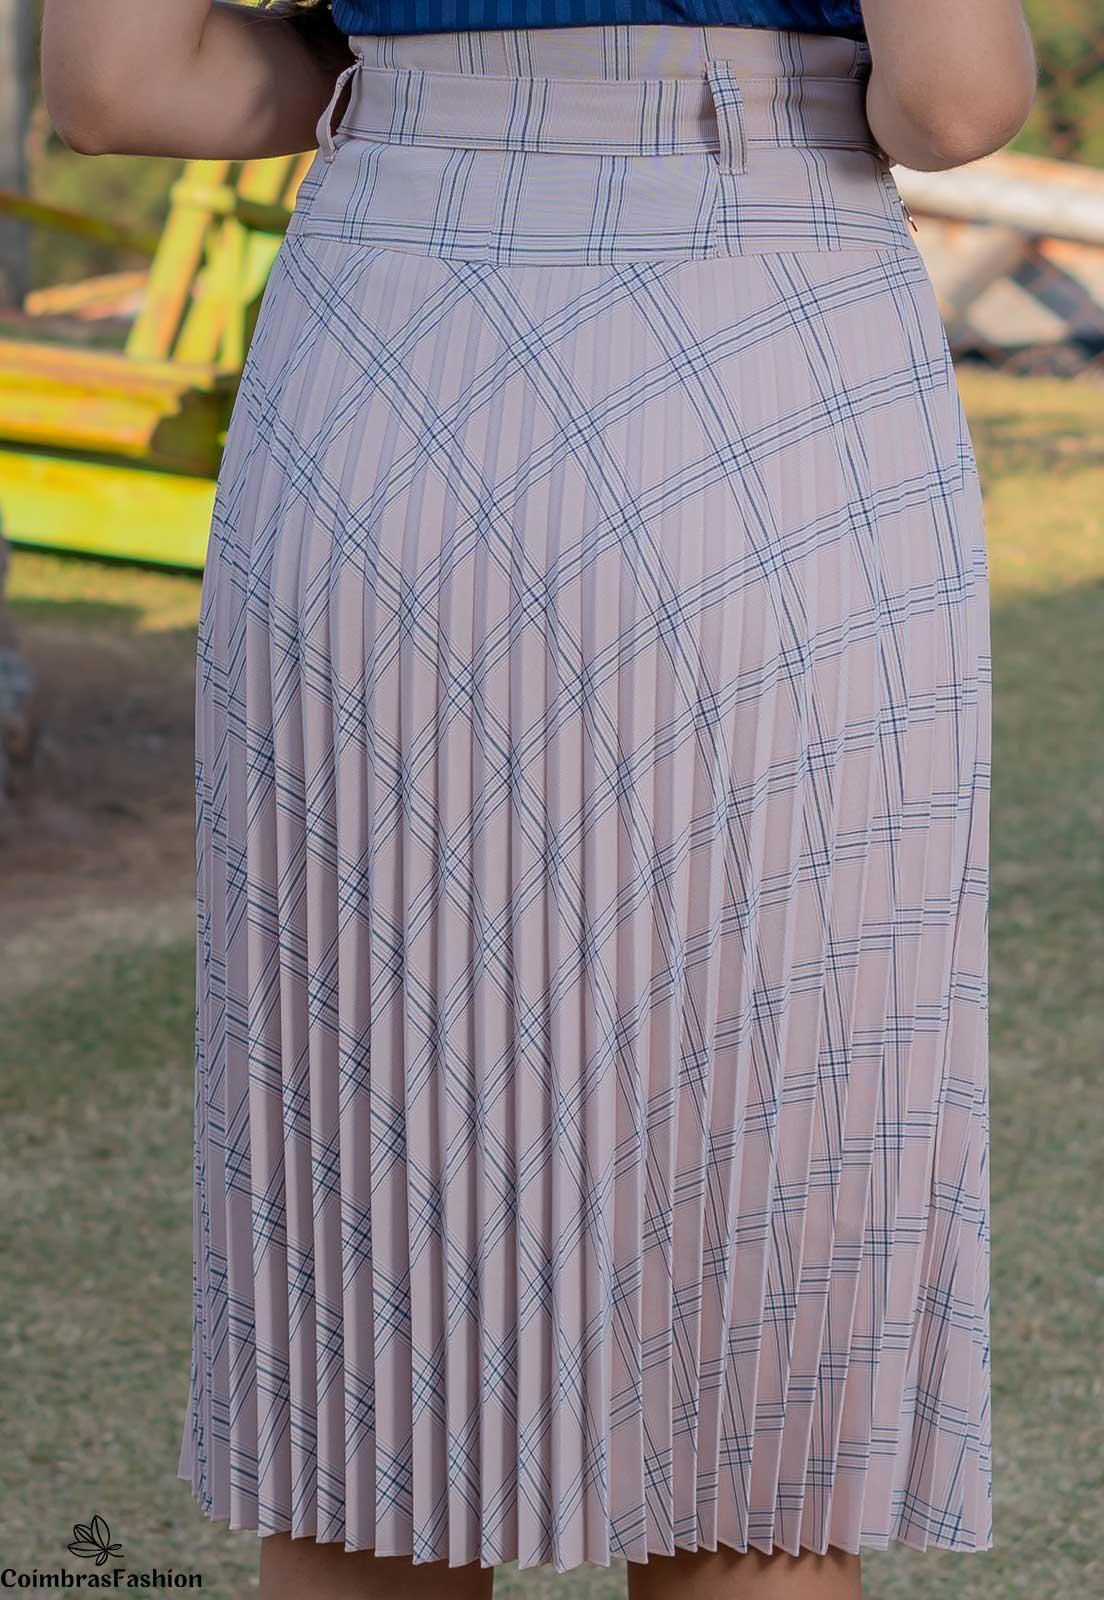 Saia plissada xadrez em alfaiataria luciana pais